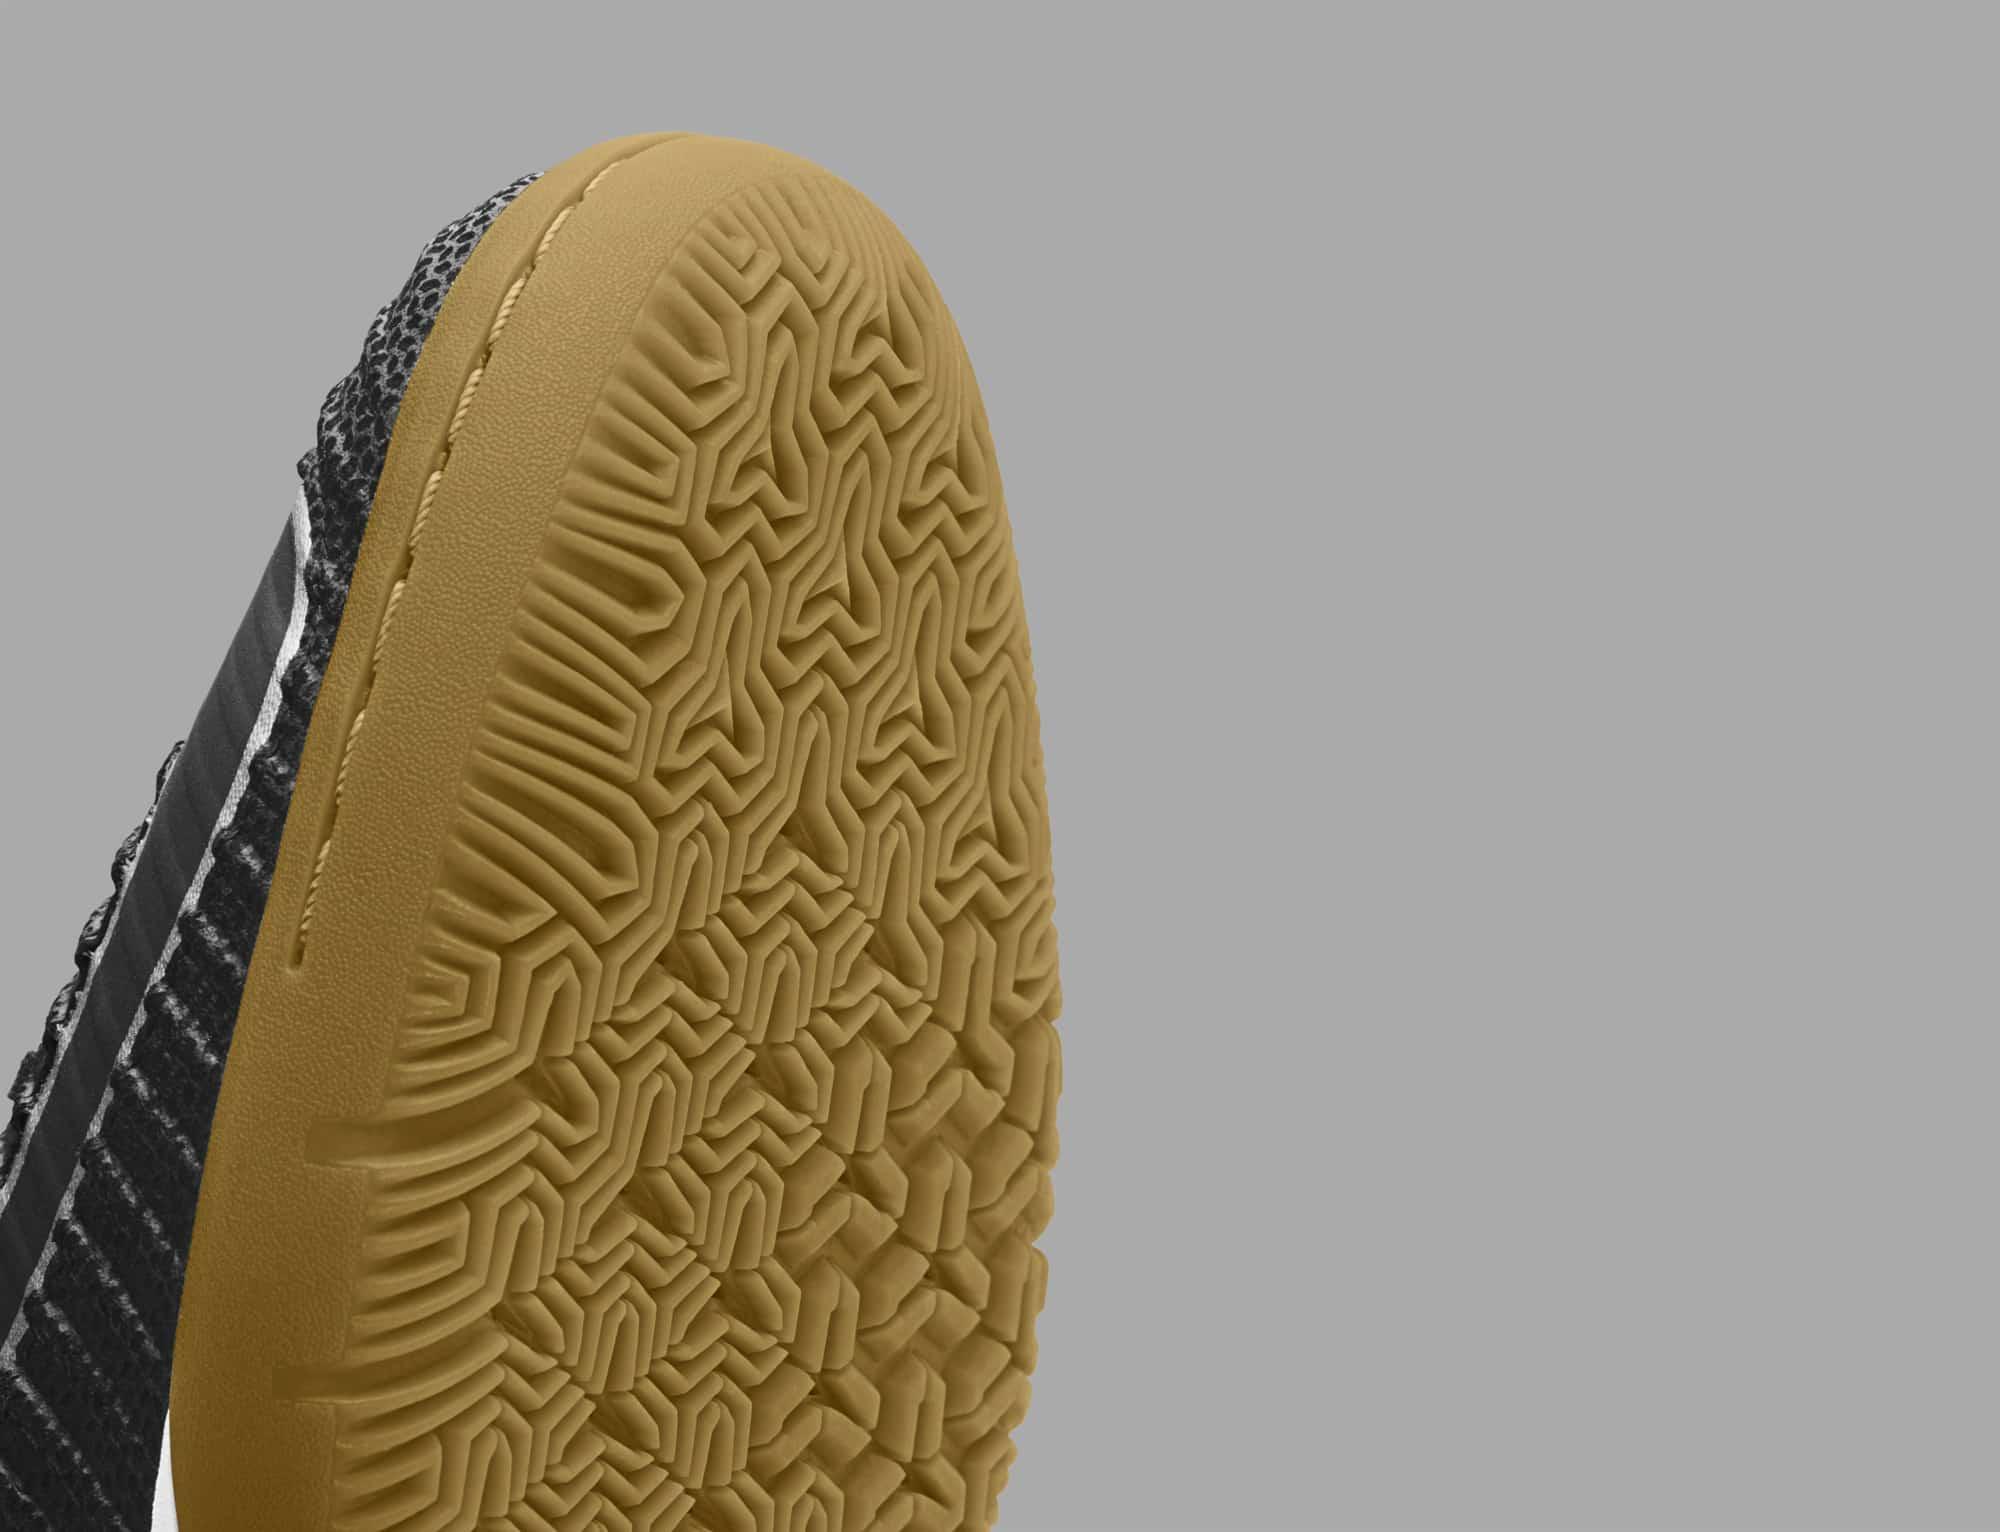 chaussures-football-nike-mercurialx-proximo-2-tech-craft-img2